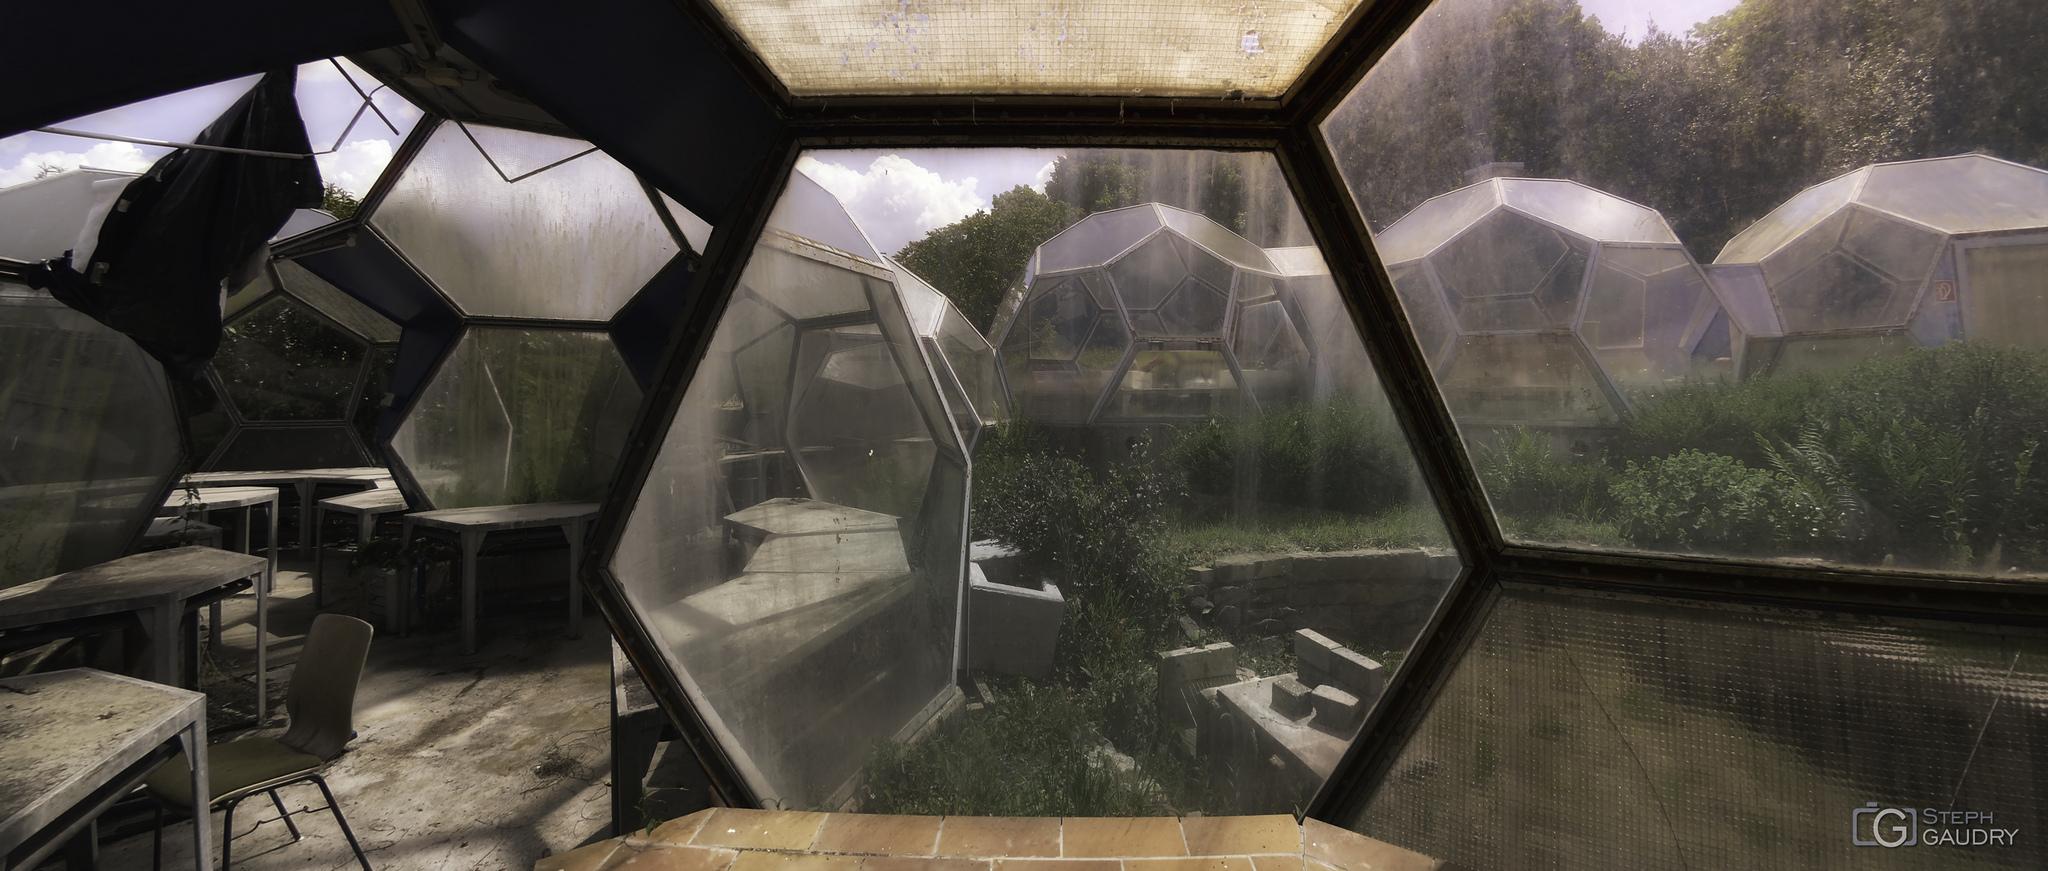 Station de terraformation - 1 [Click to start slideshow]